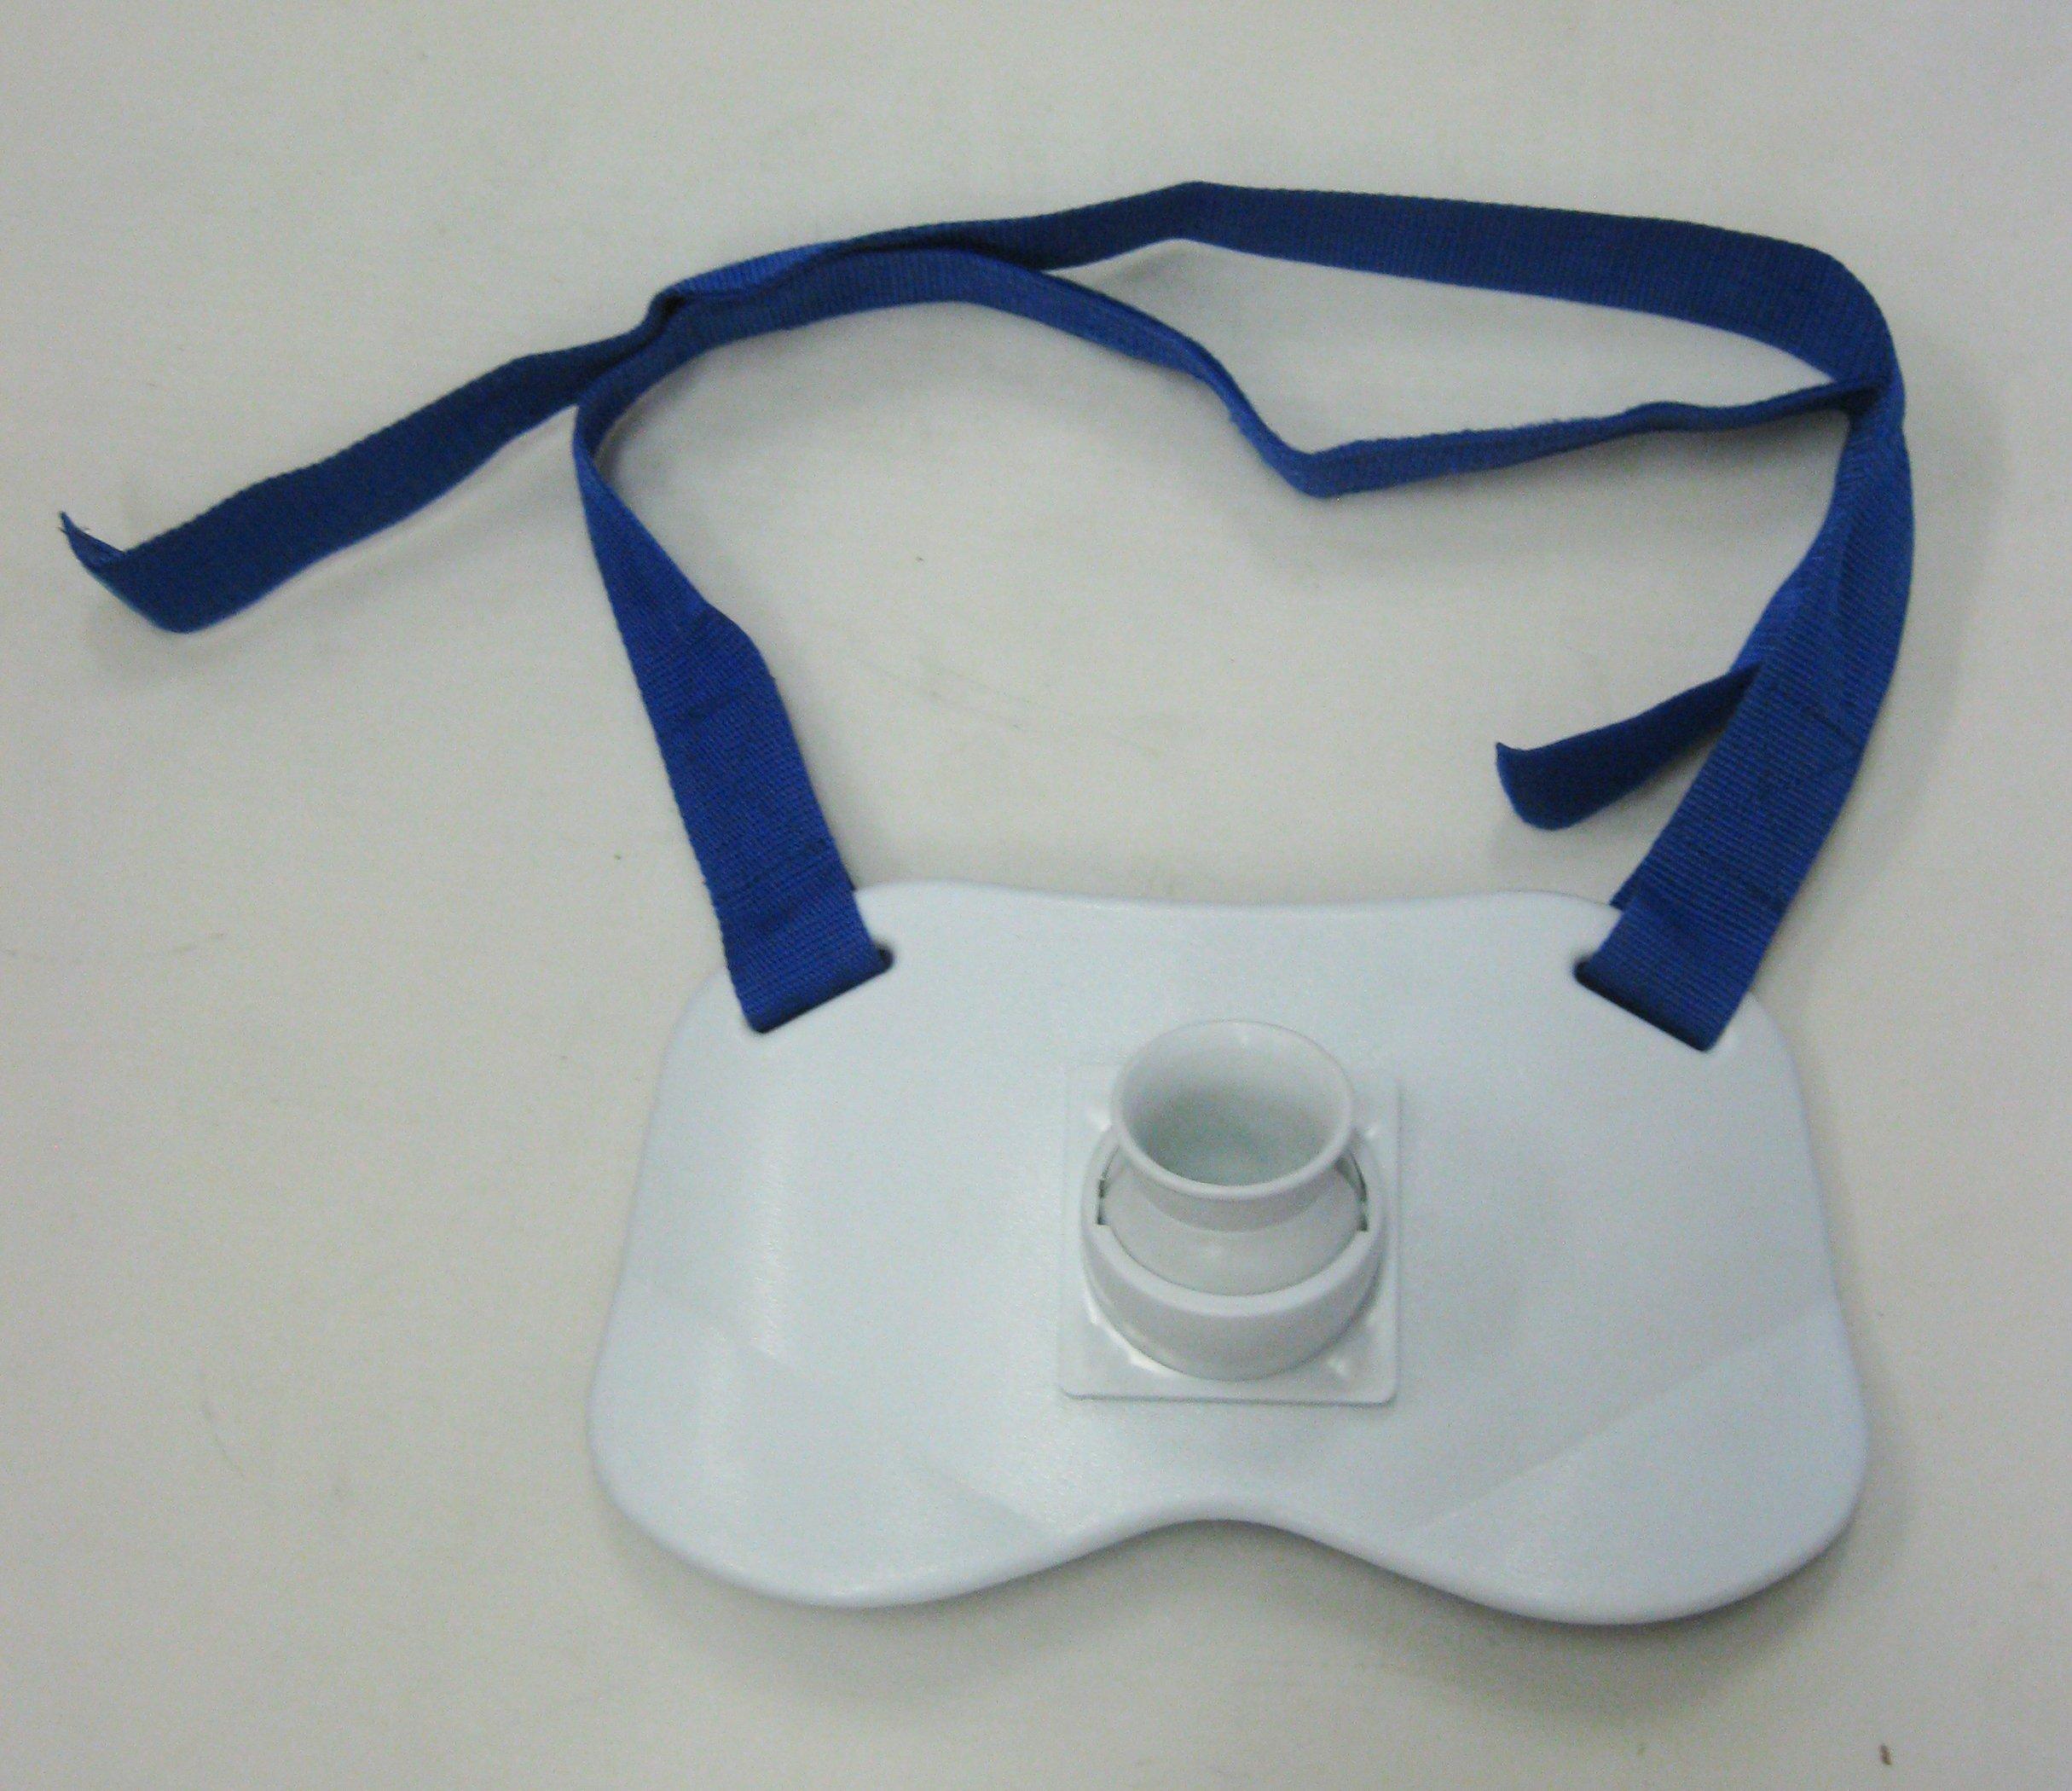 KUFA Fishing Fighting Belt (12.5''x7'') 18 oz TS-A4